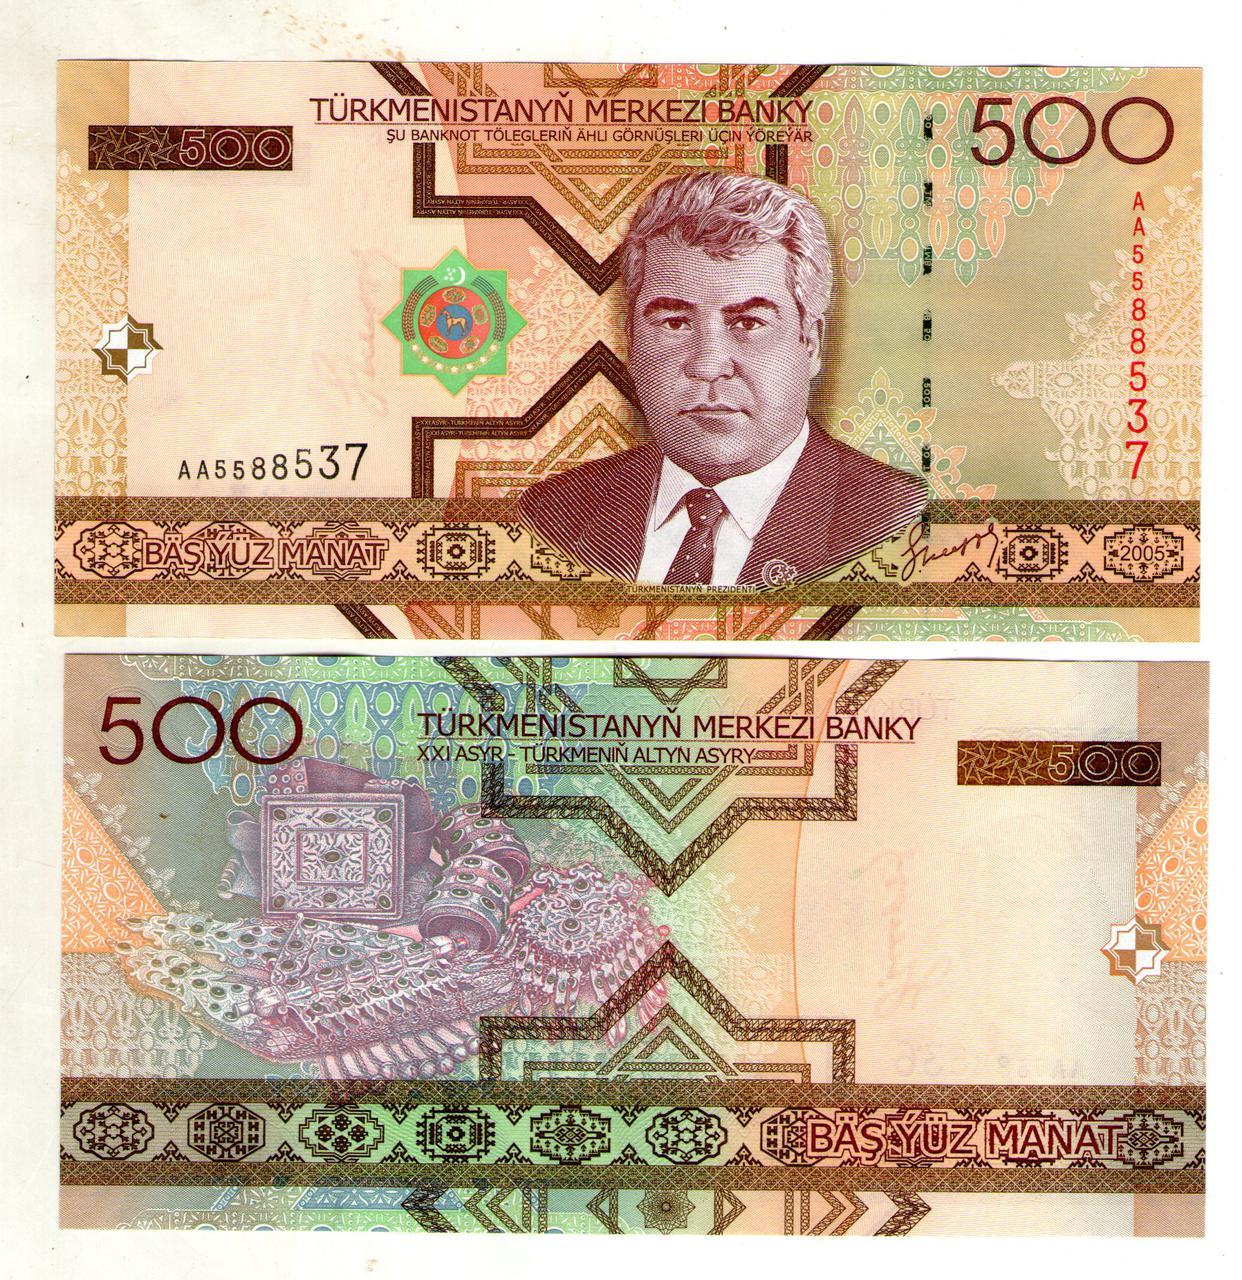 Туркмения 500 манат 2005 год состояние UNS